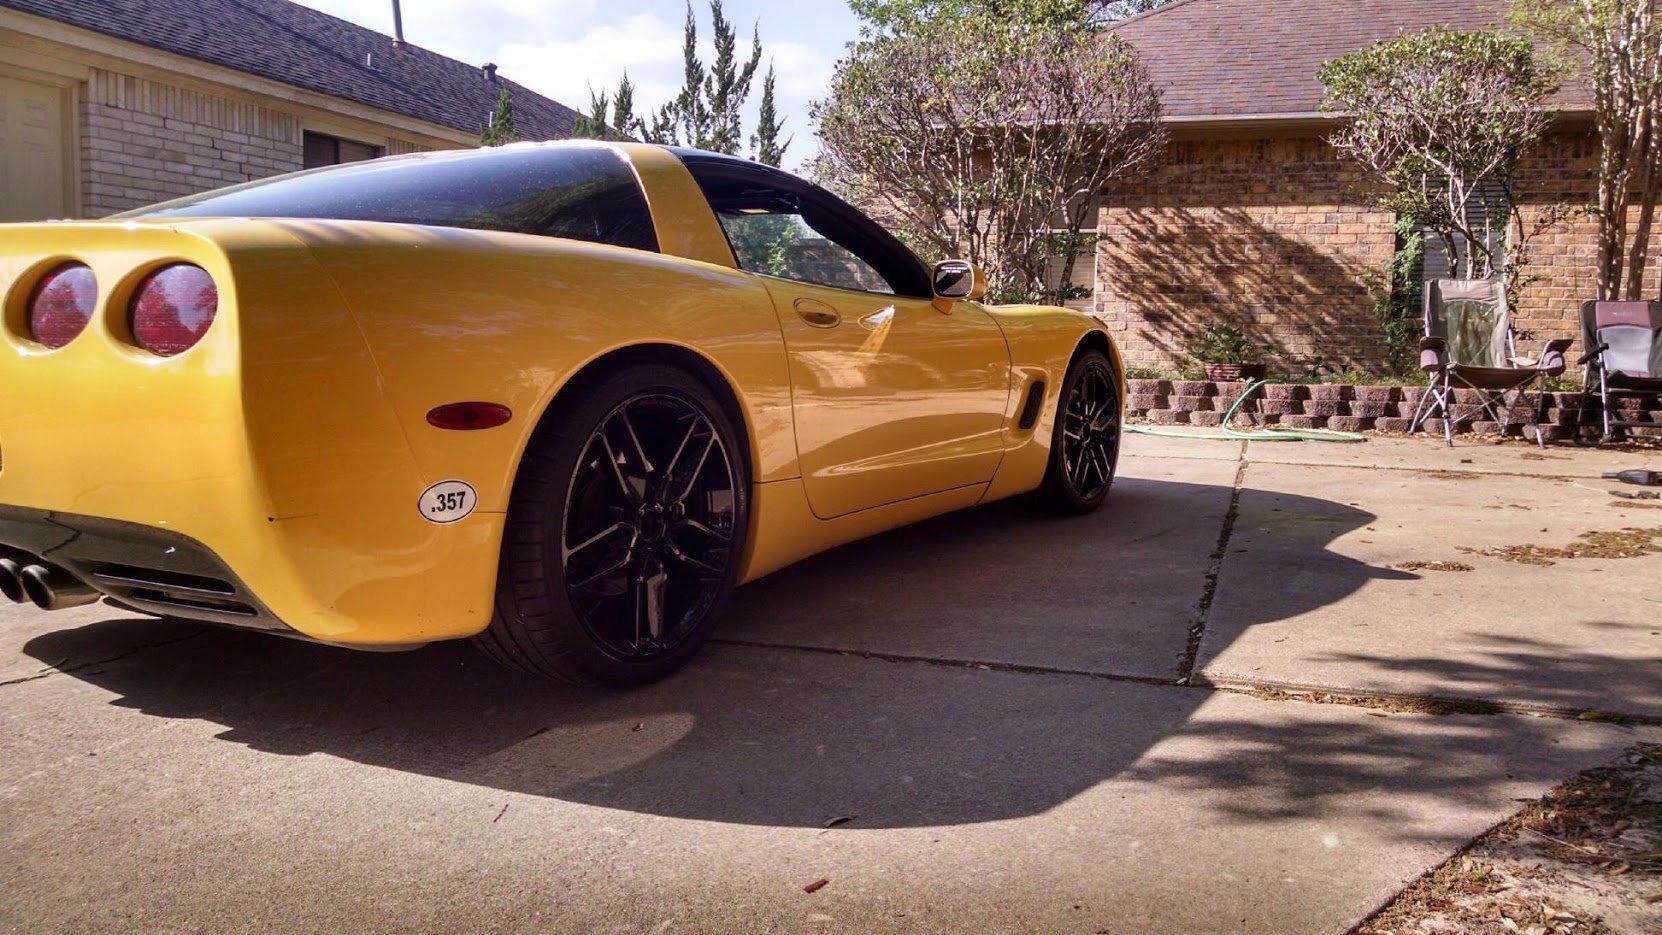 C7 Wheels On A C5 Corvetteforum Chevrolet Corvette Forum Discussion